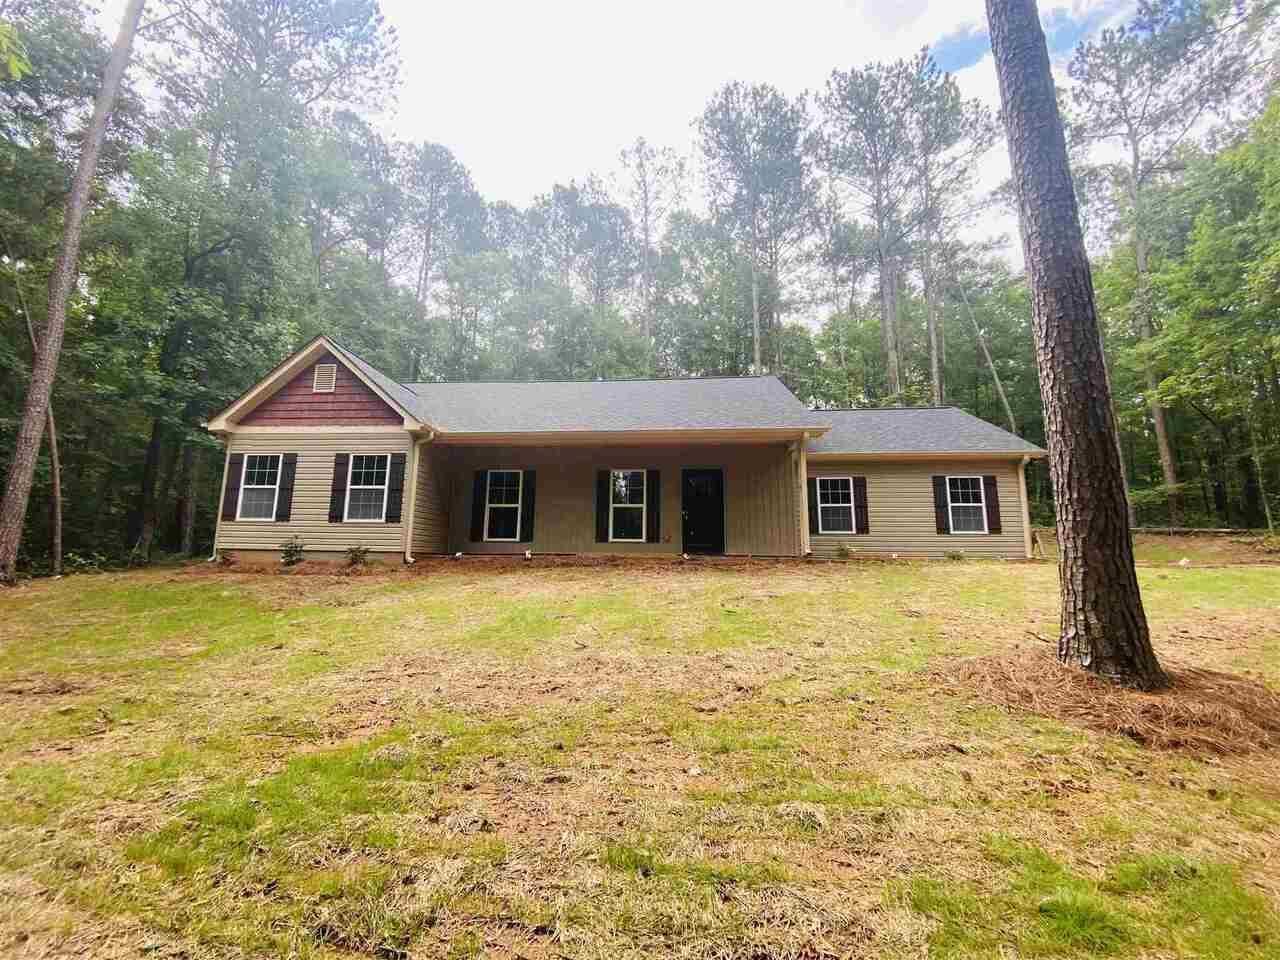 194 Kingfisher Ct, Monticello, GA 31064 - MLS#: 9001469